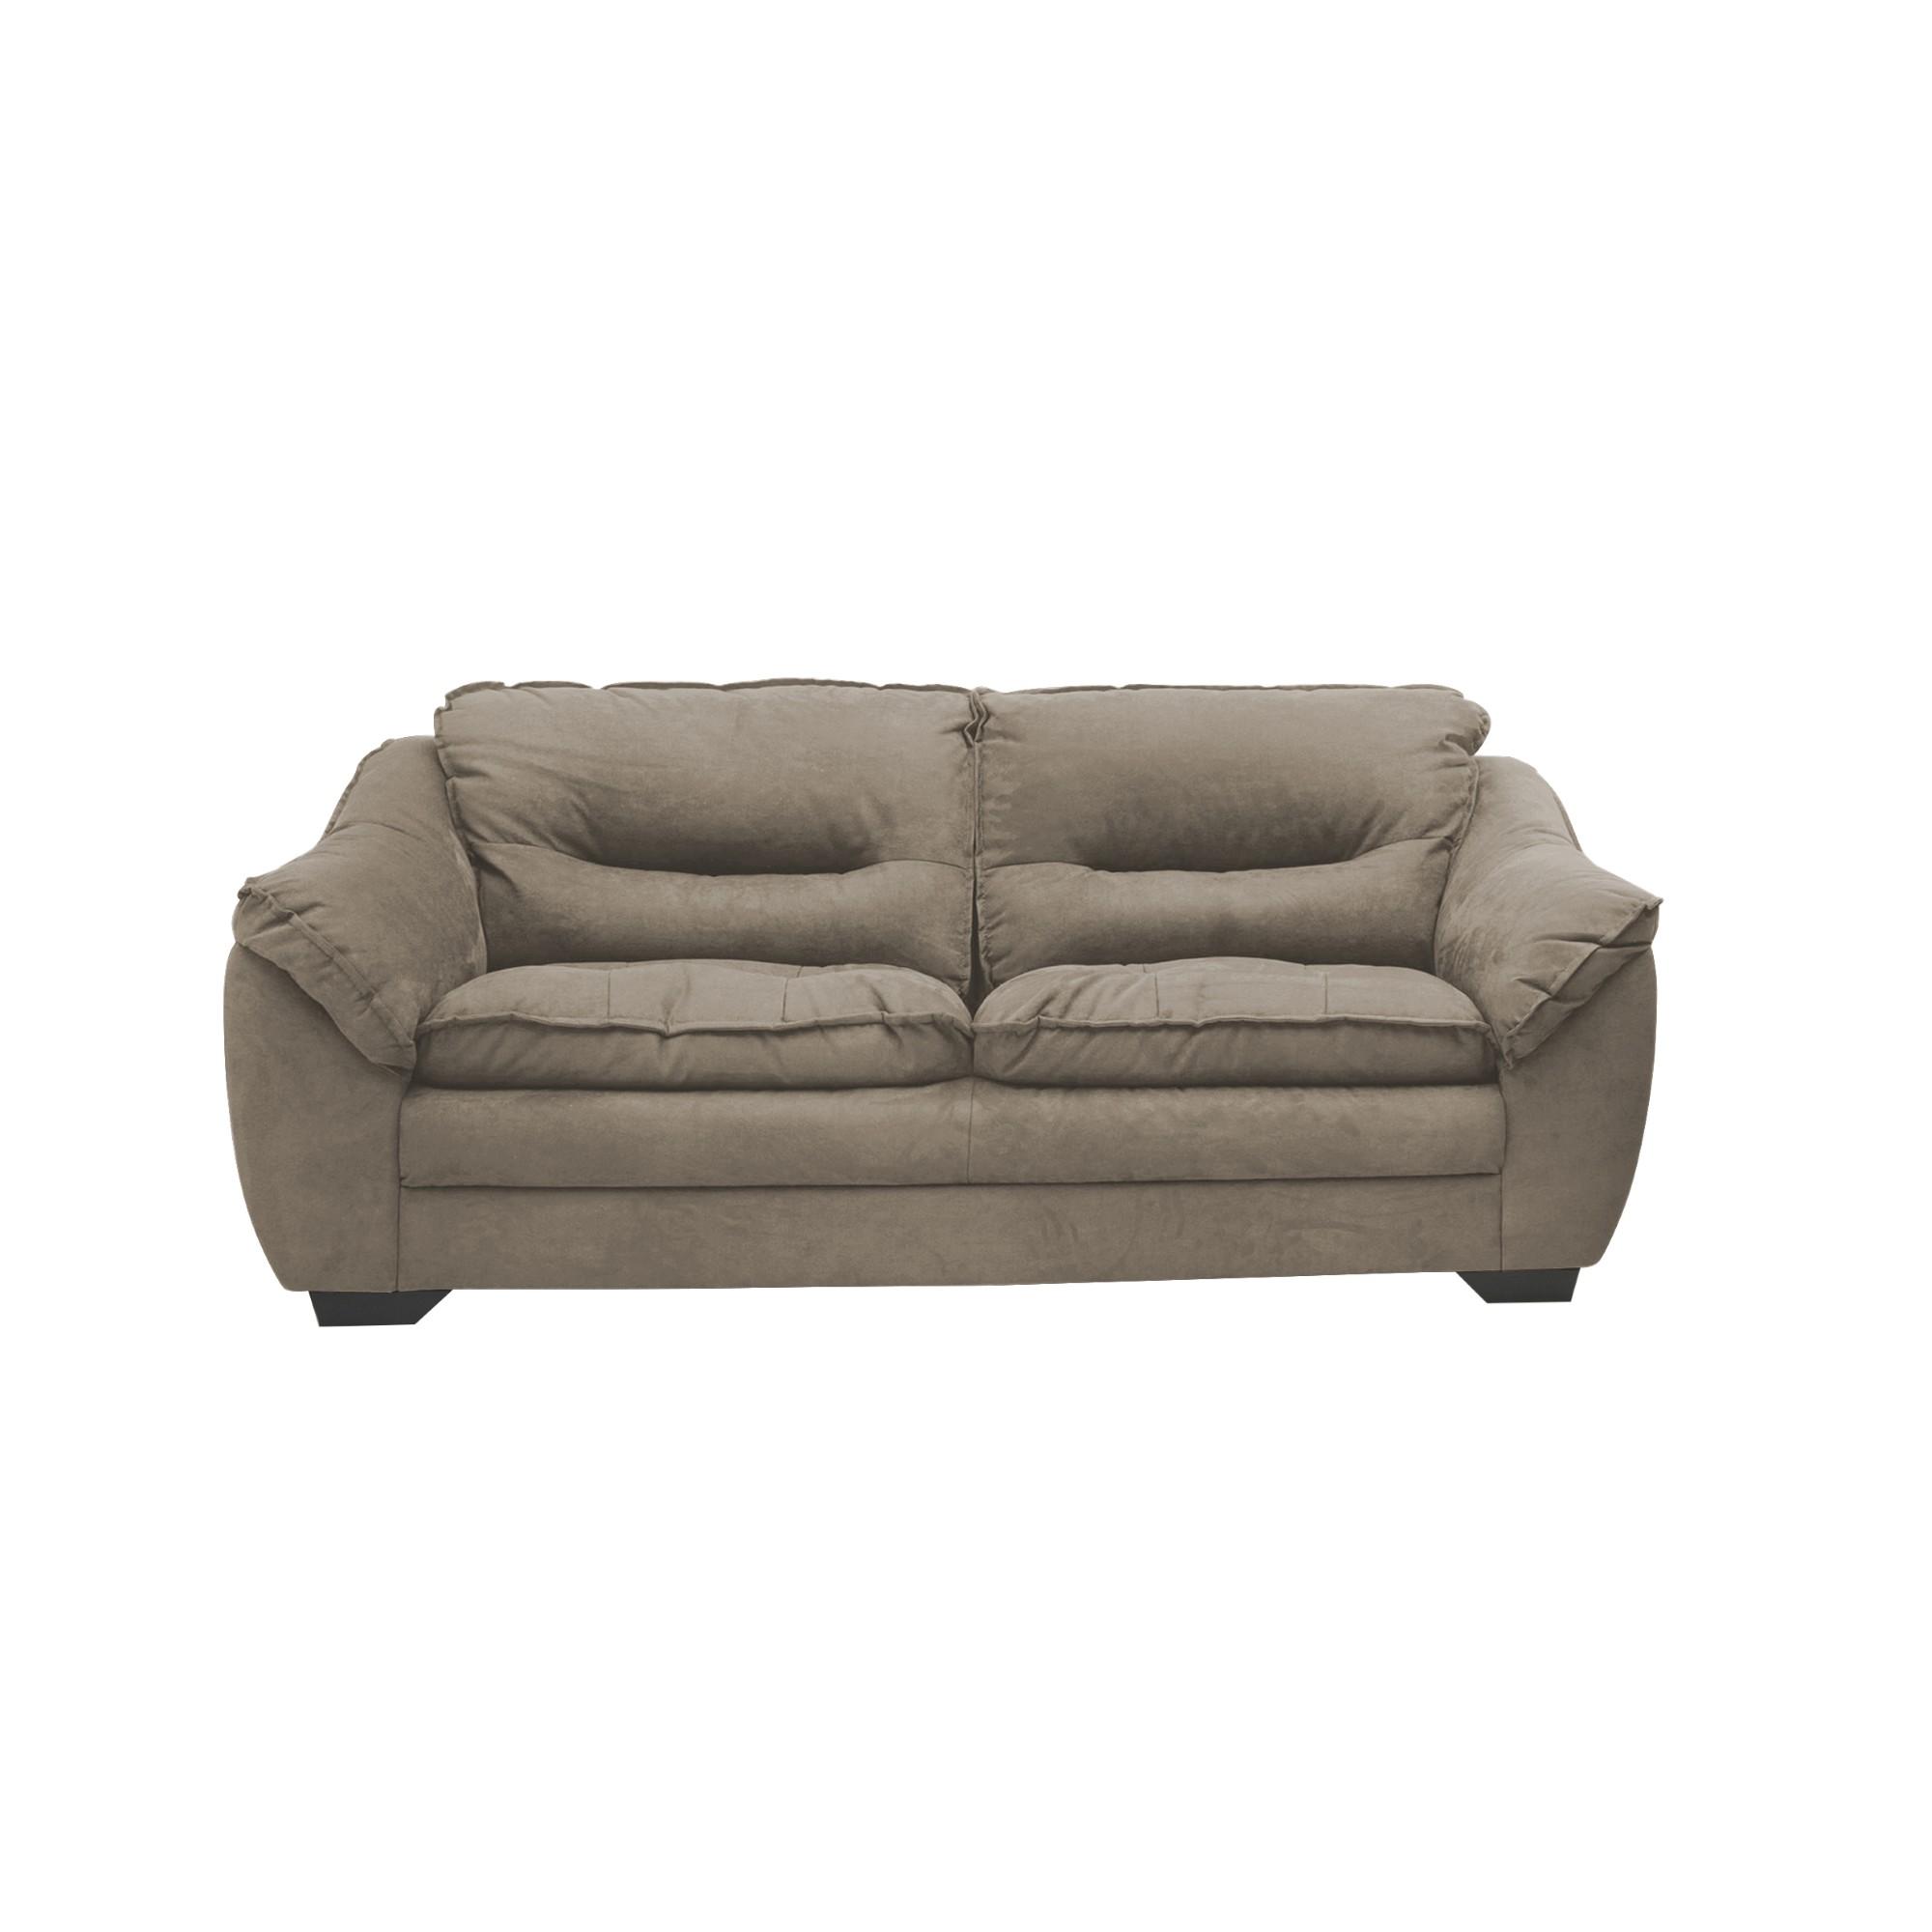 Sofa Floyd 3 Lugares Veludo 210 cm Marrom - Spazzio